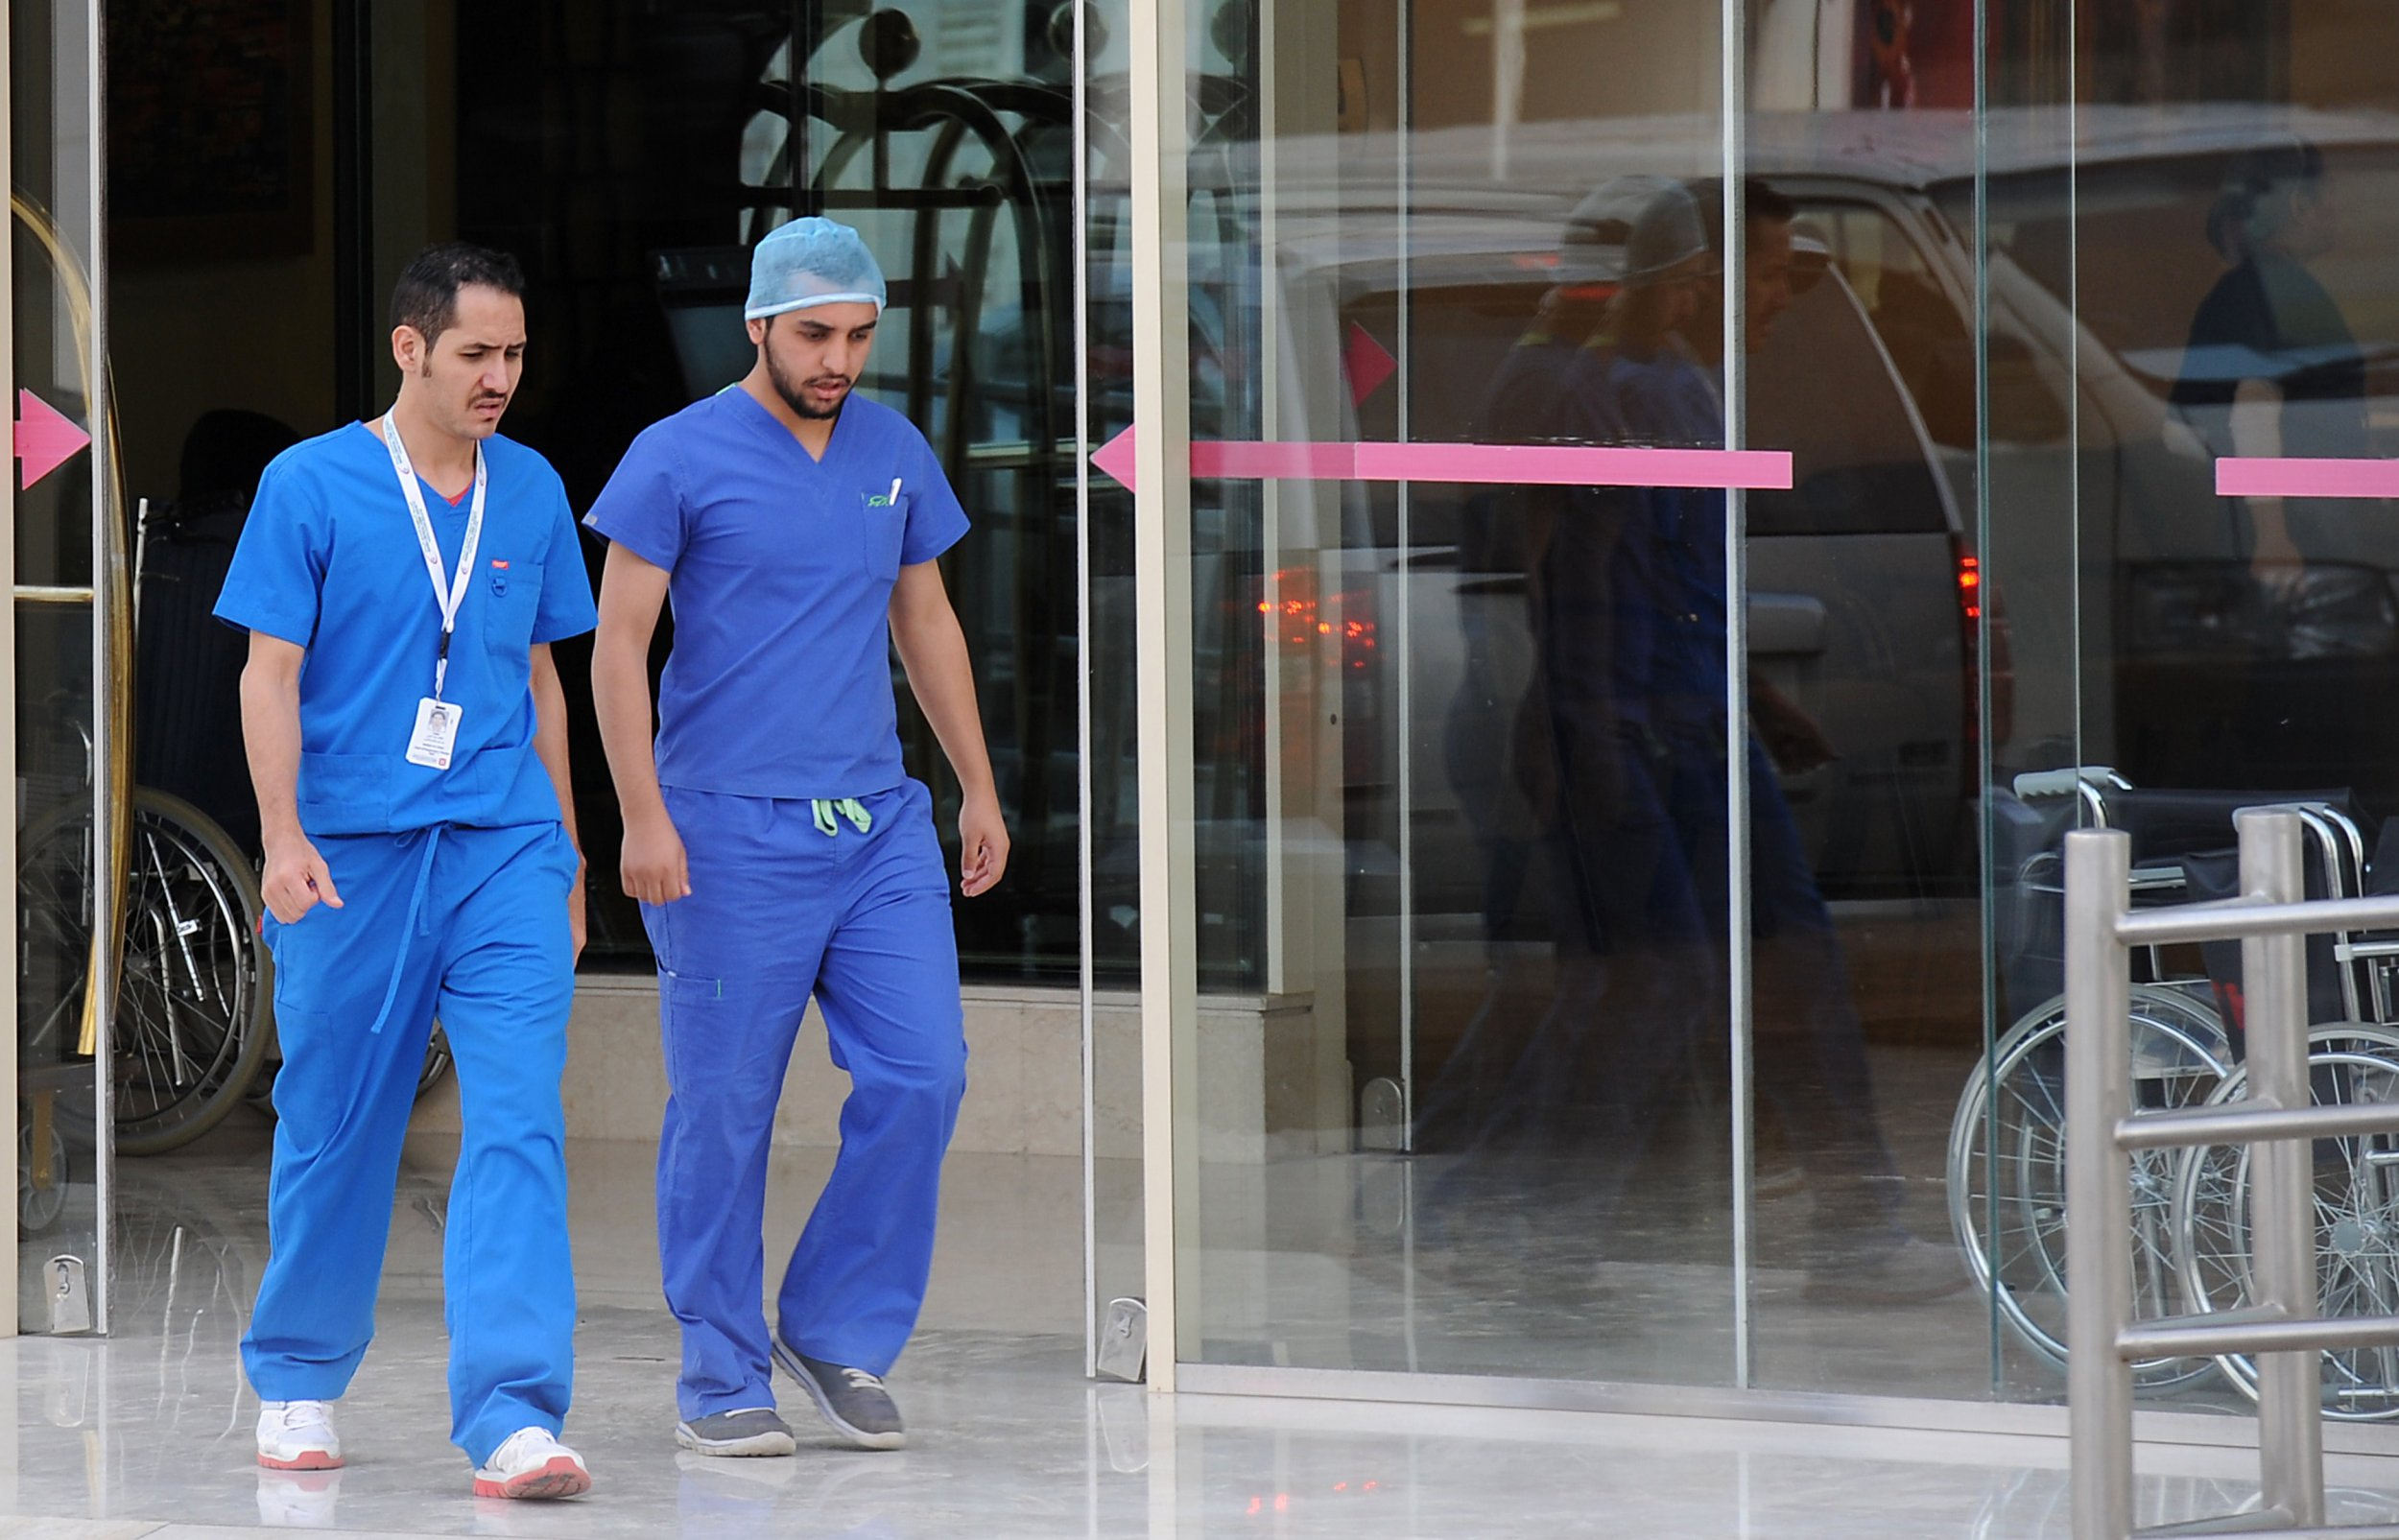 Saudi doctors in Riyadh